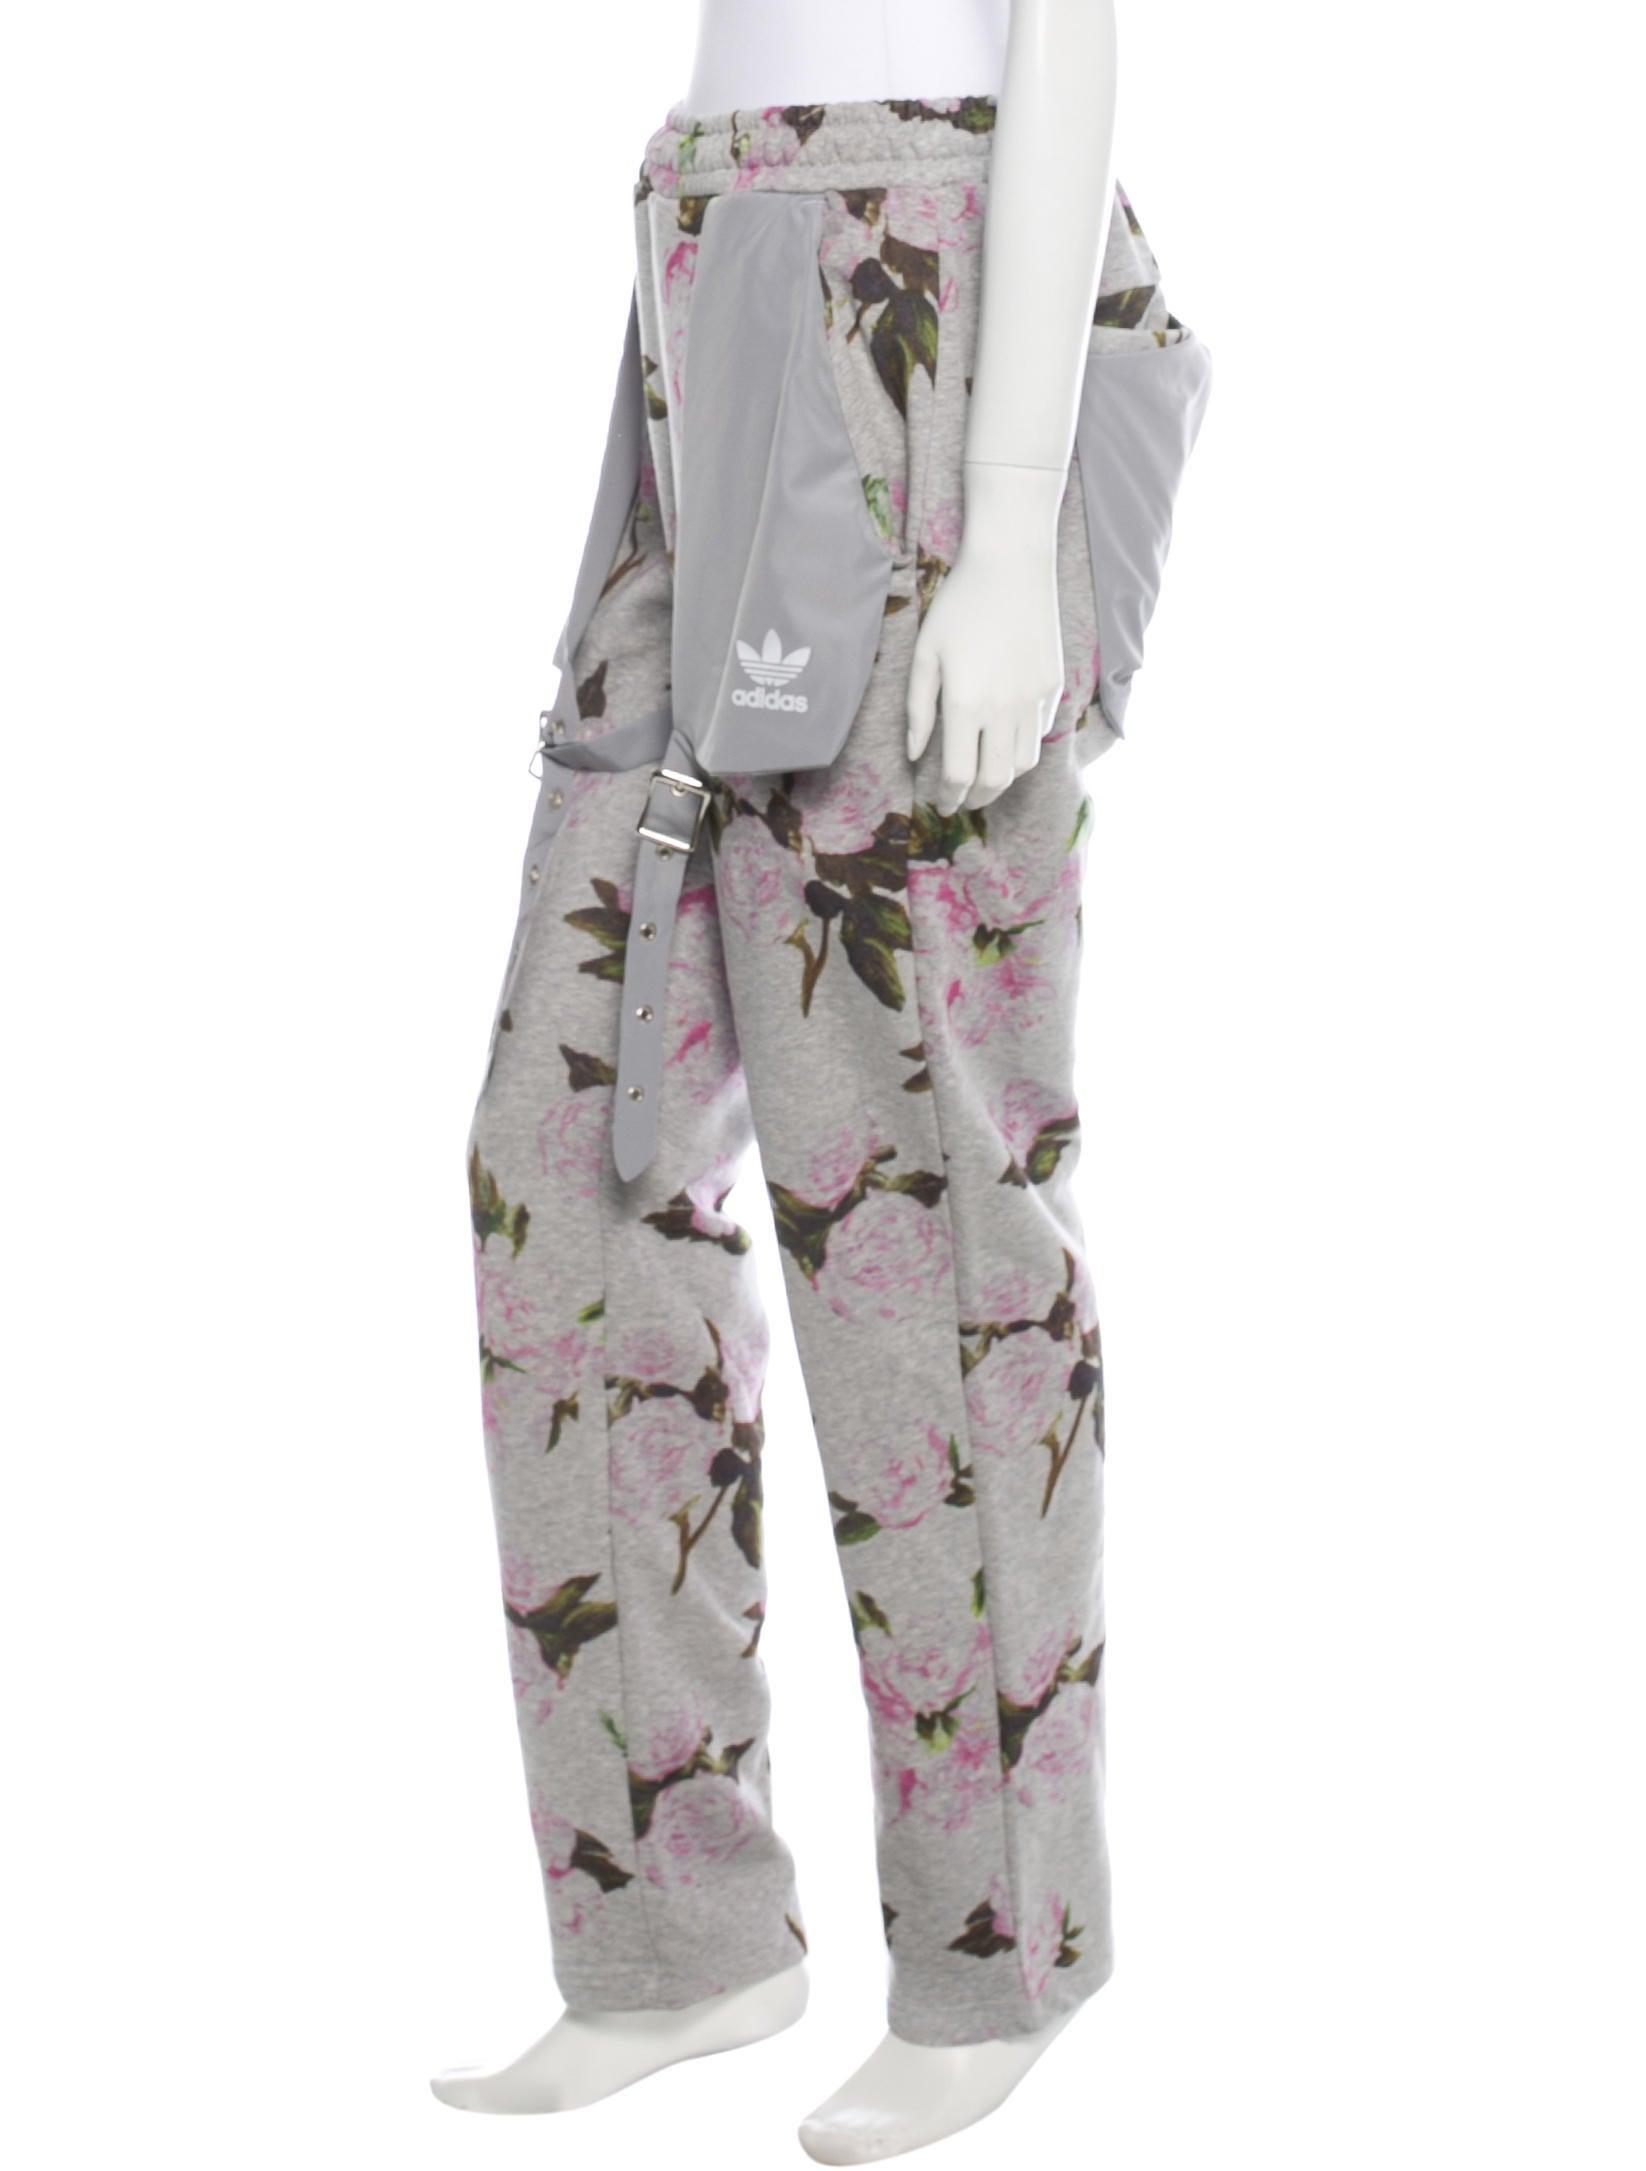 jeremy scott x adidas floral print track pants w   tags - clothing